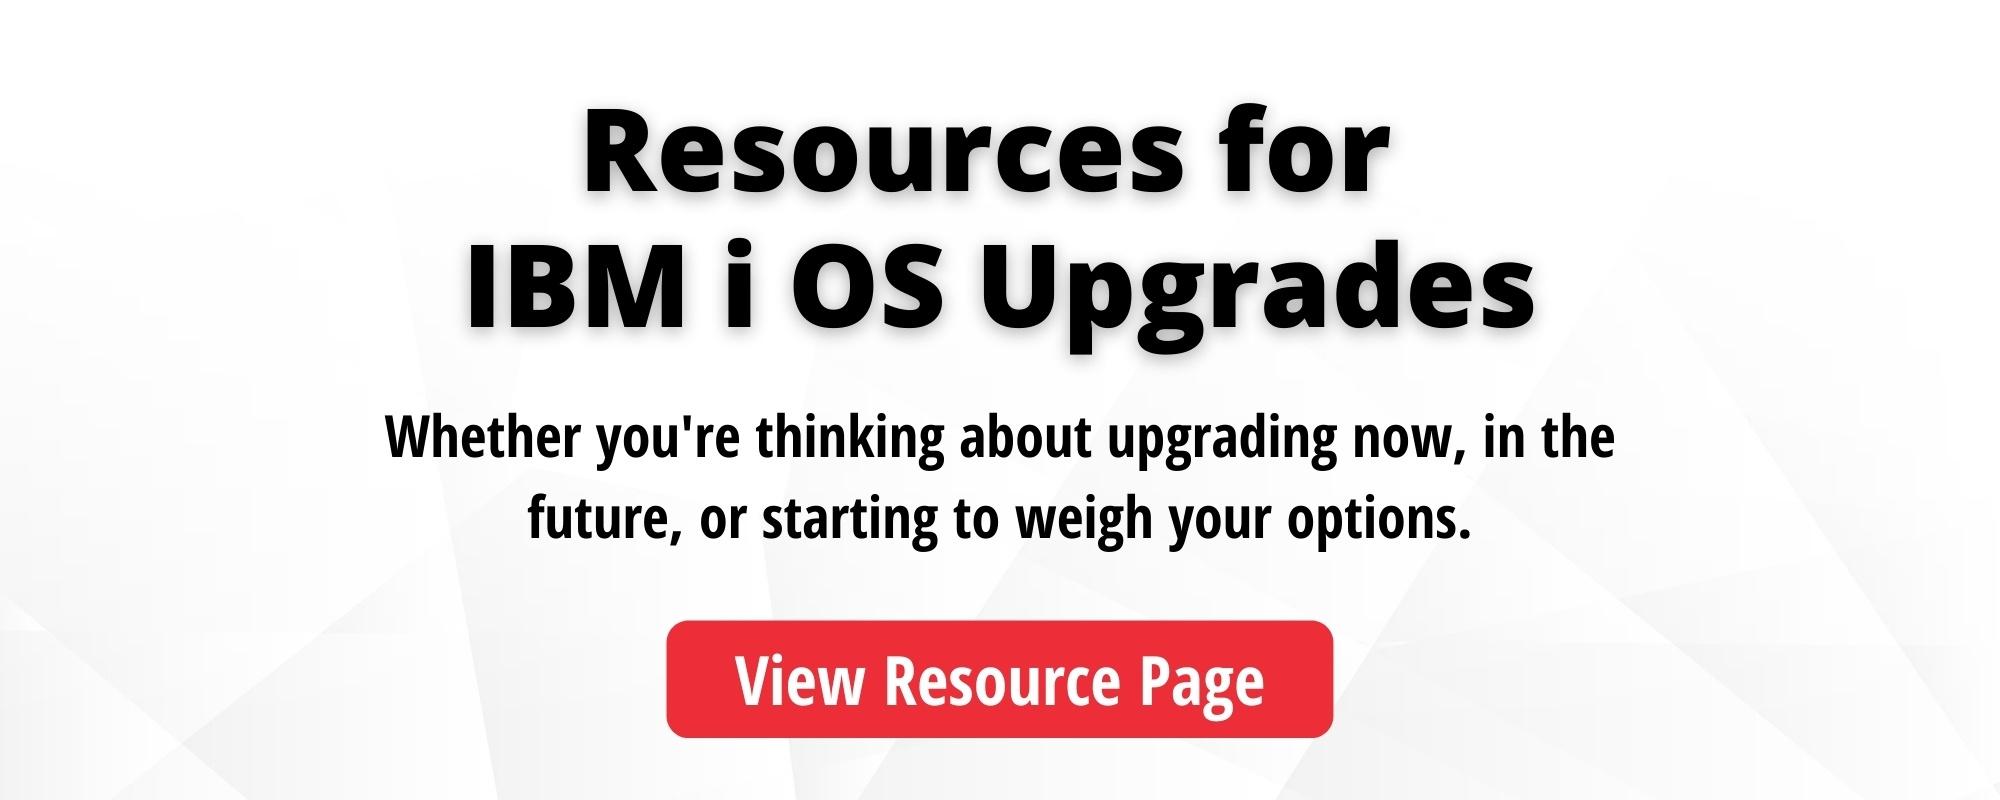 OS Upgrades Resource | WEBSITE